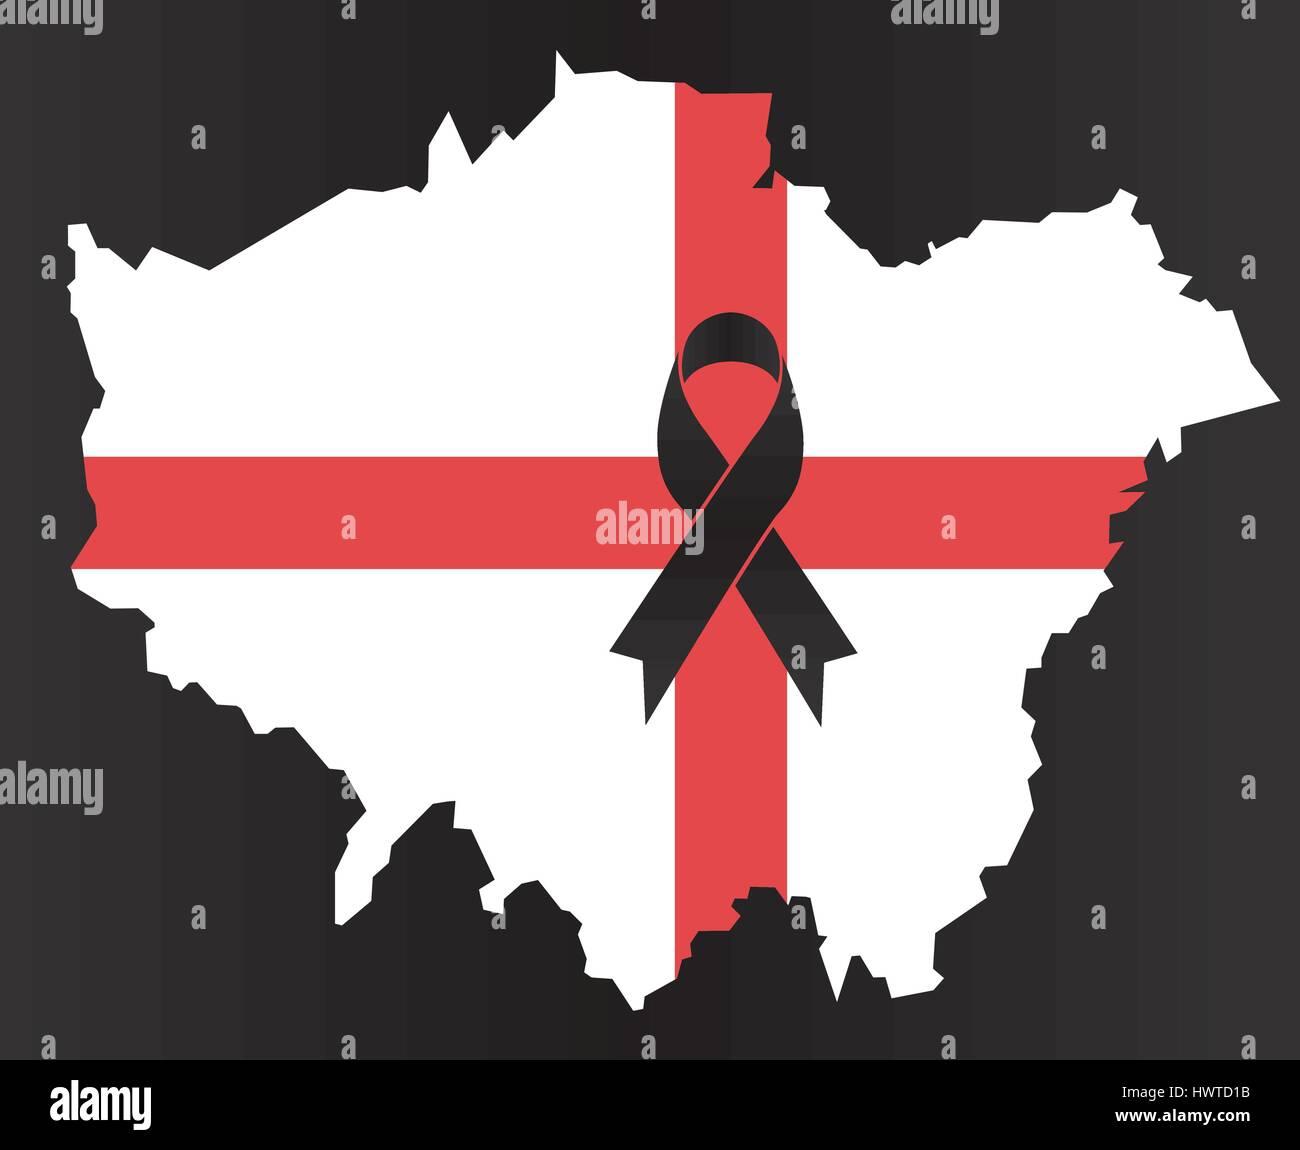 London Condolence Map